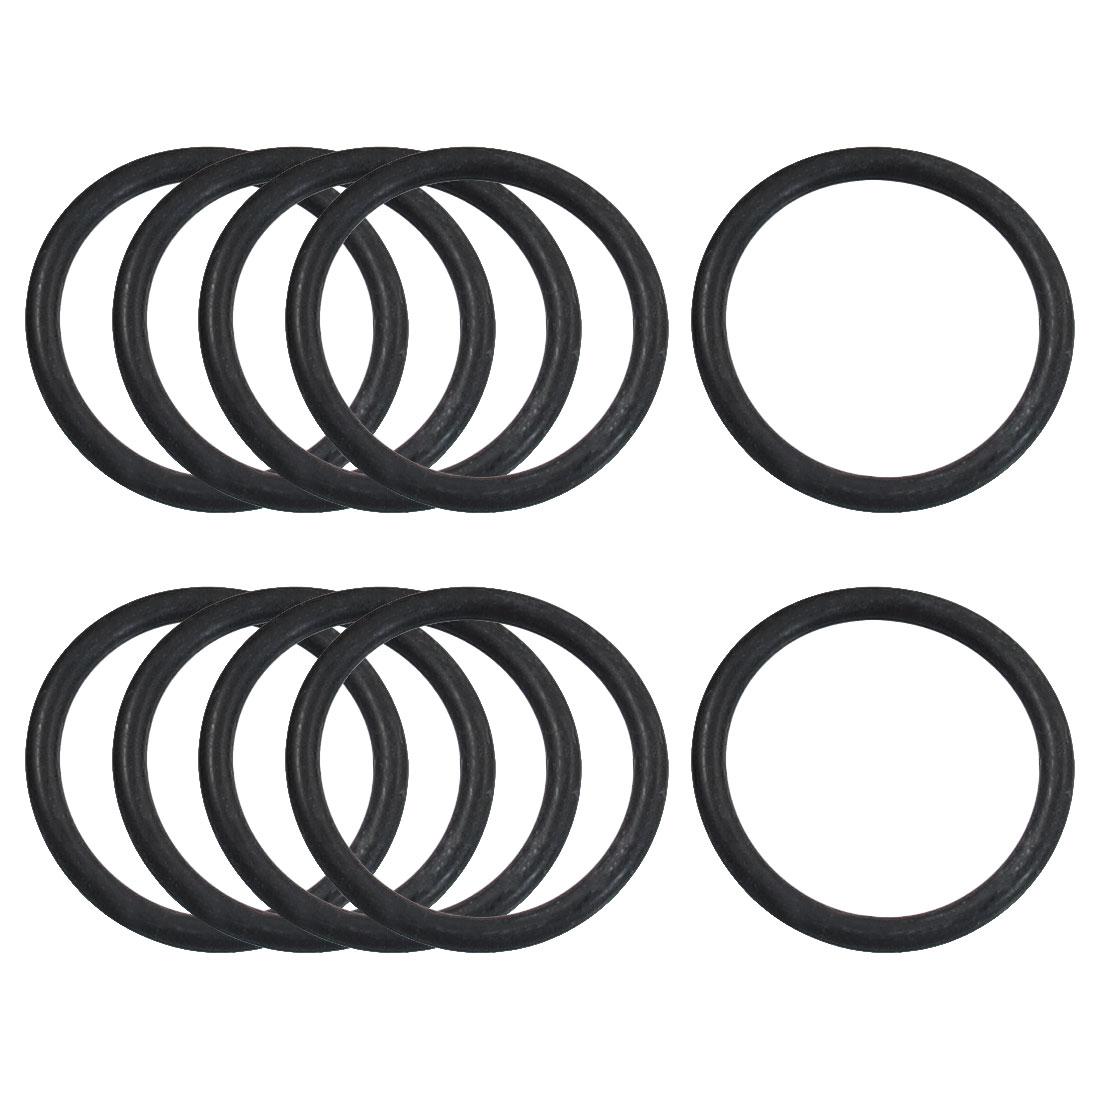 10 Pcs 27mm x 2.4mm Sealing Oil Filter O Rings Gaskets Black